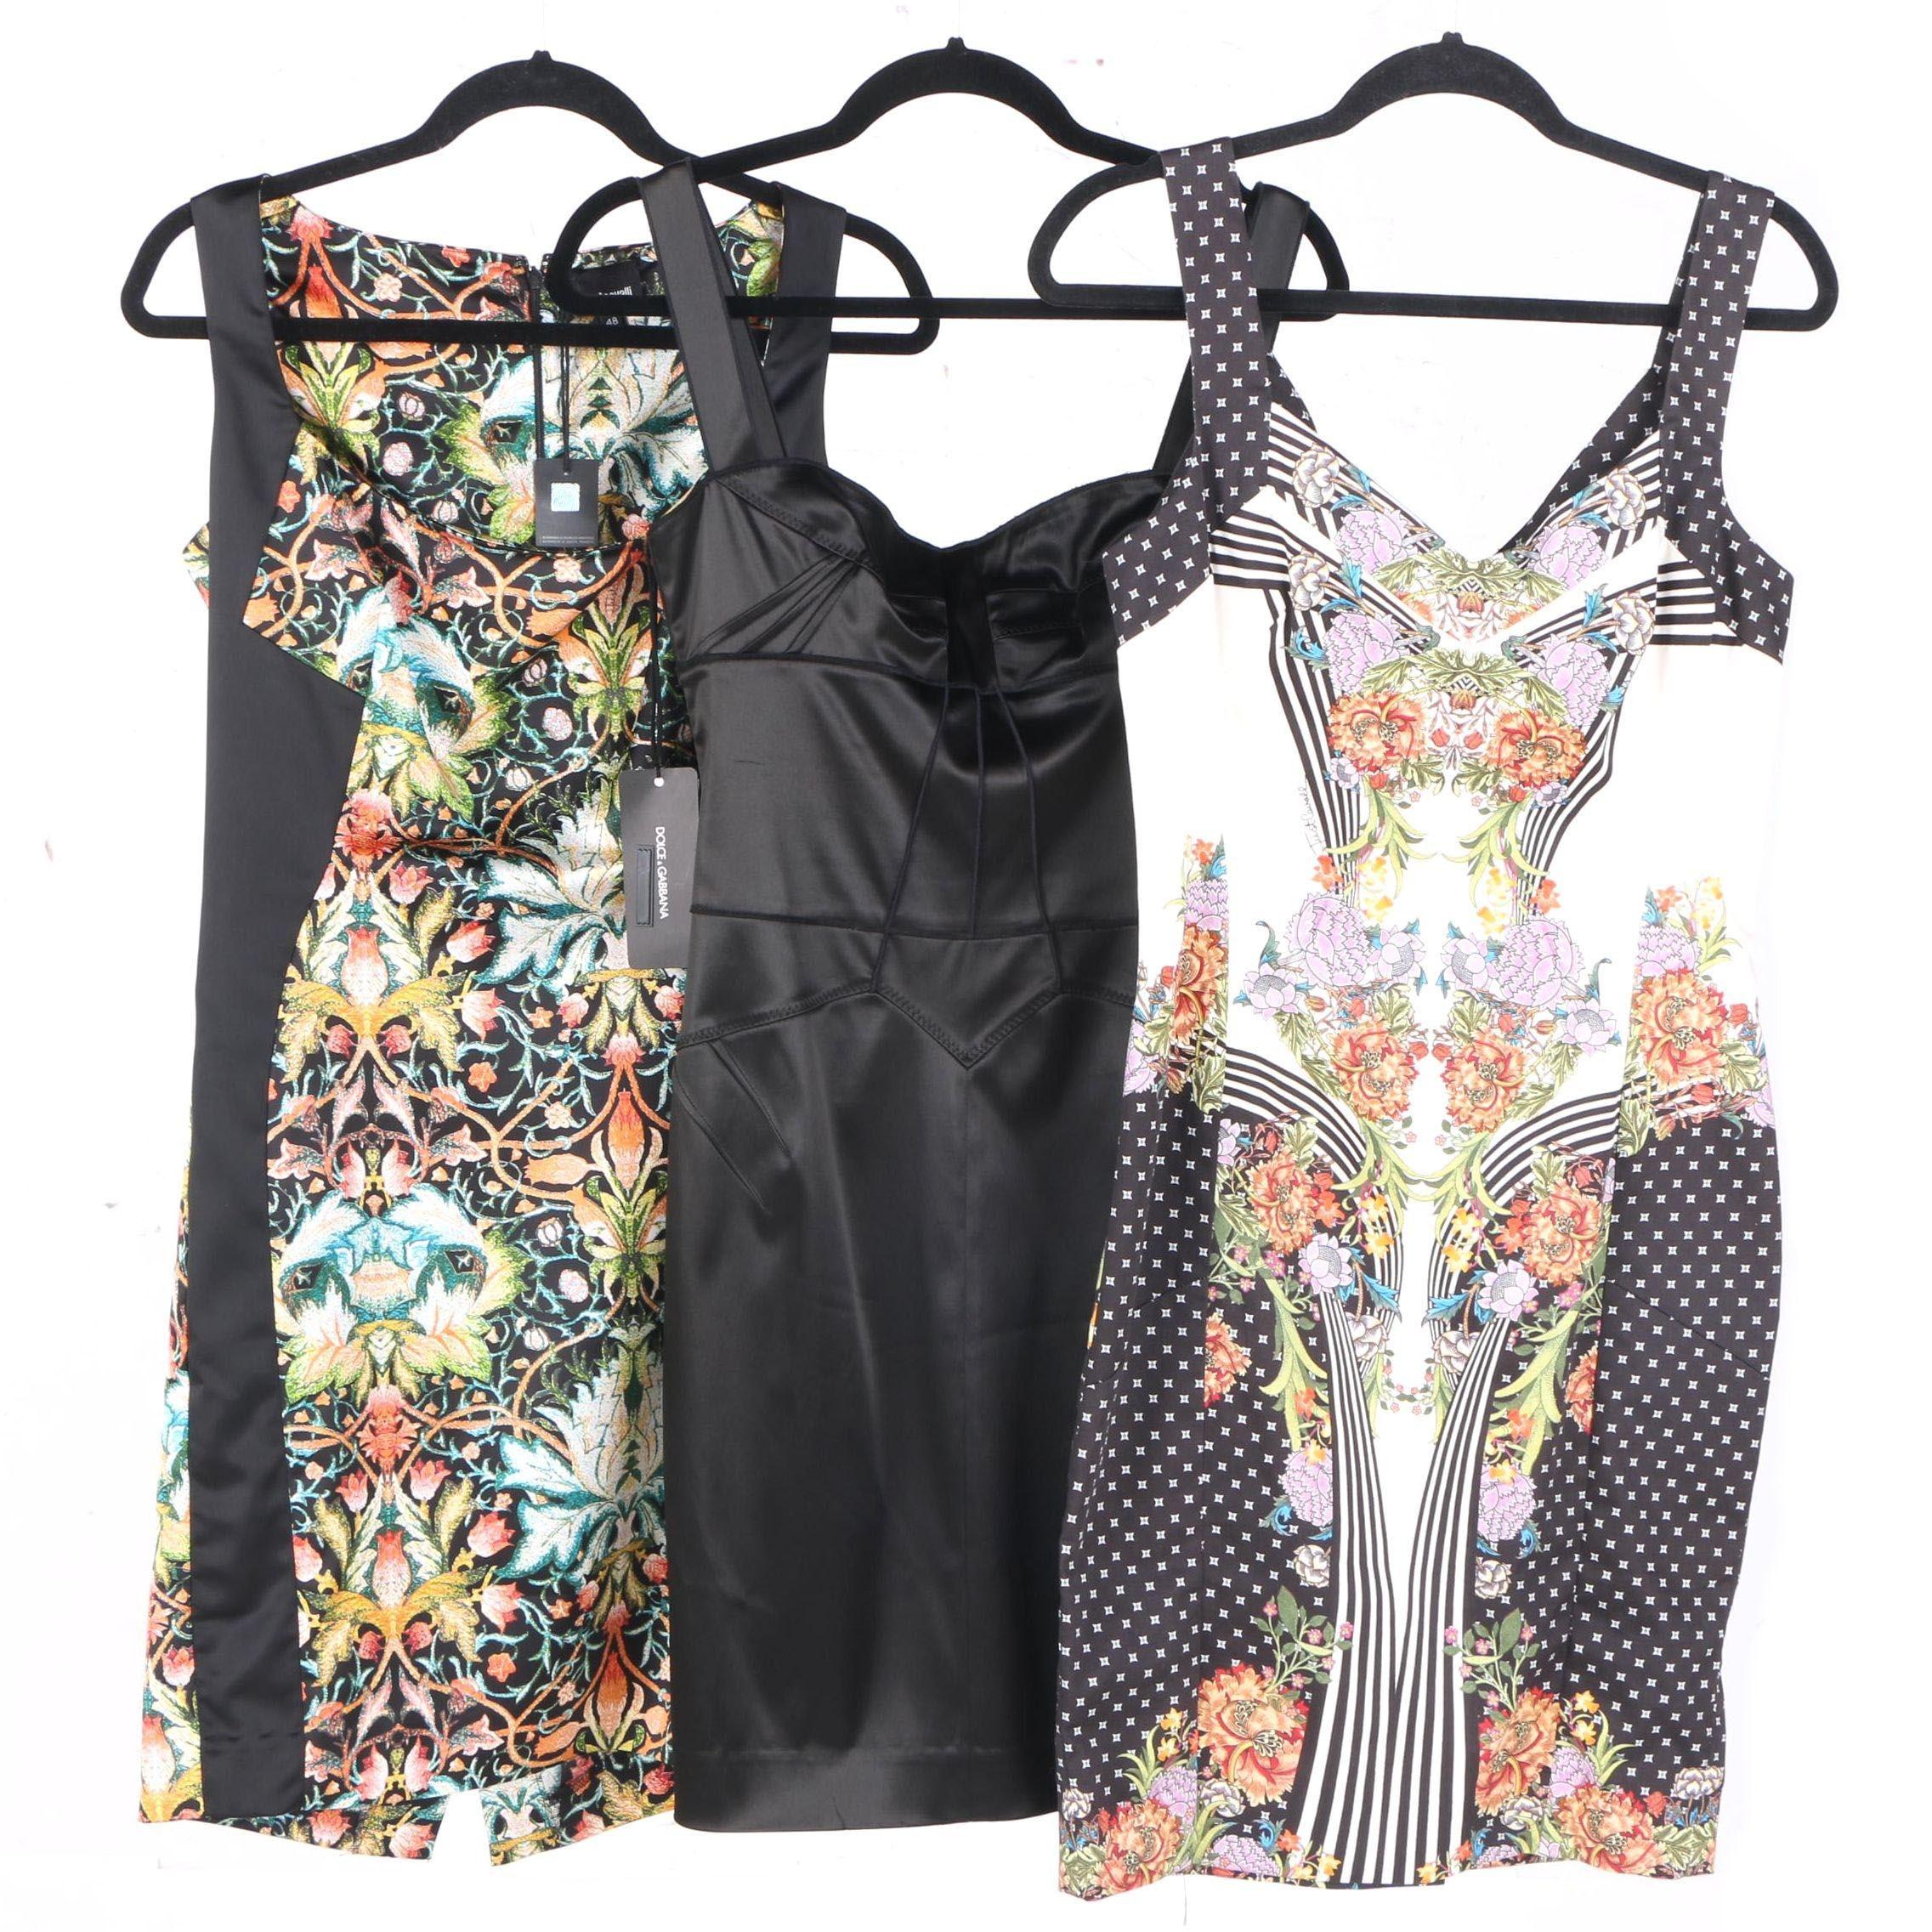 Dolce & Gabbana and Just Cavalli Women's Dresses